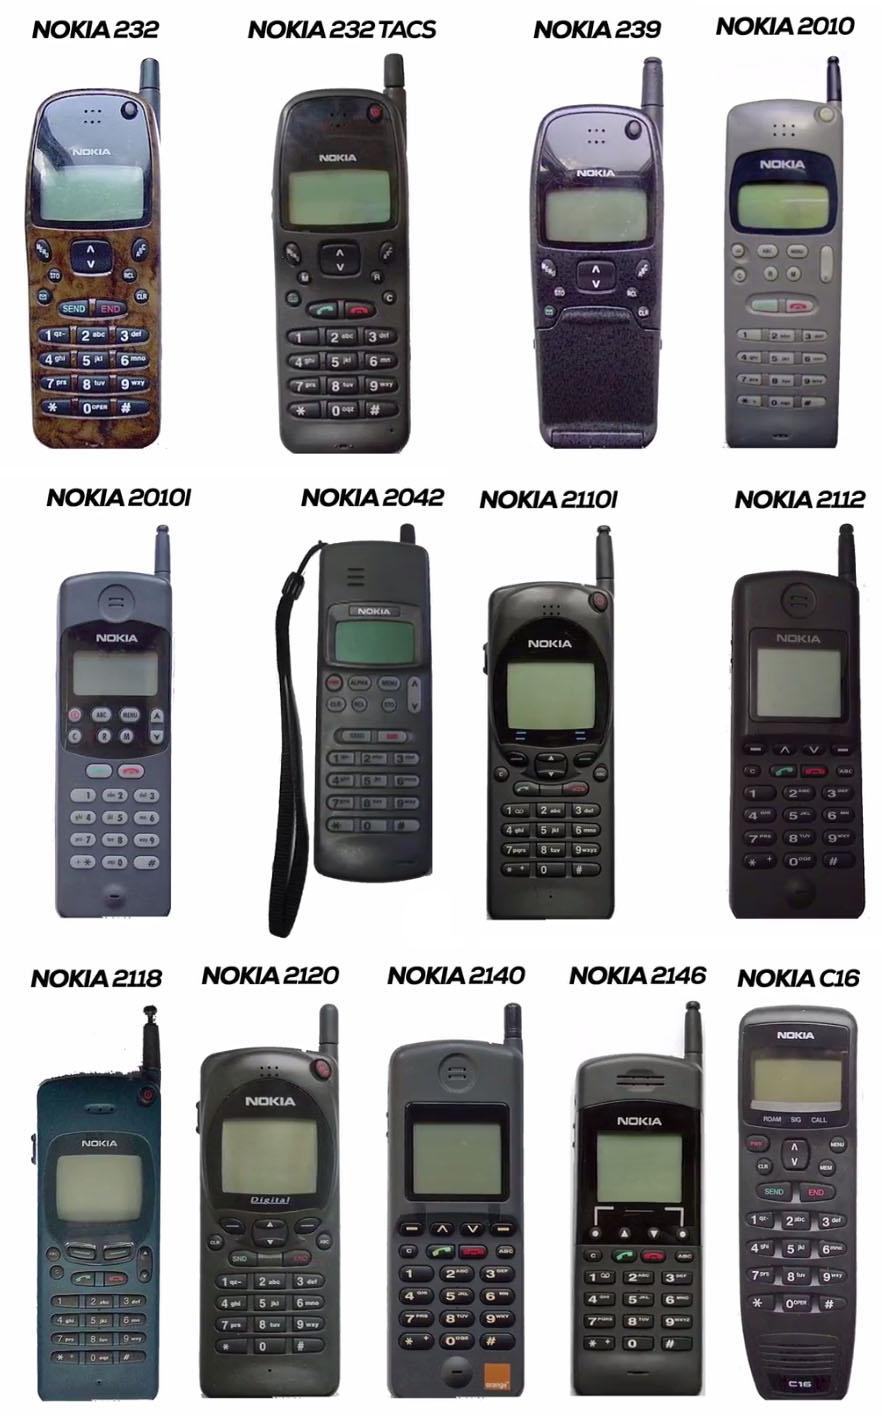 Nokia Mobile Phones in 1994